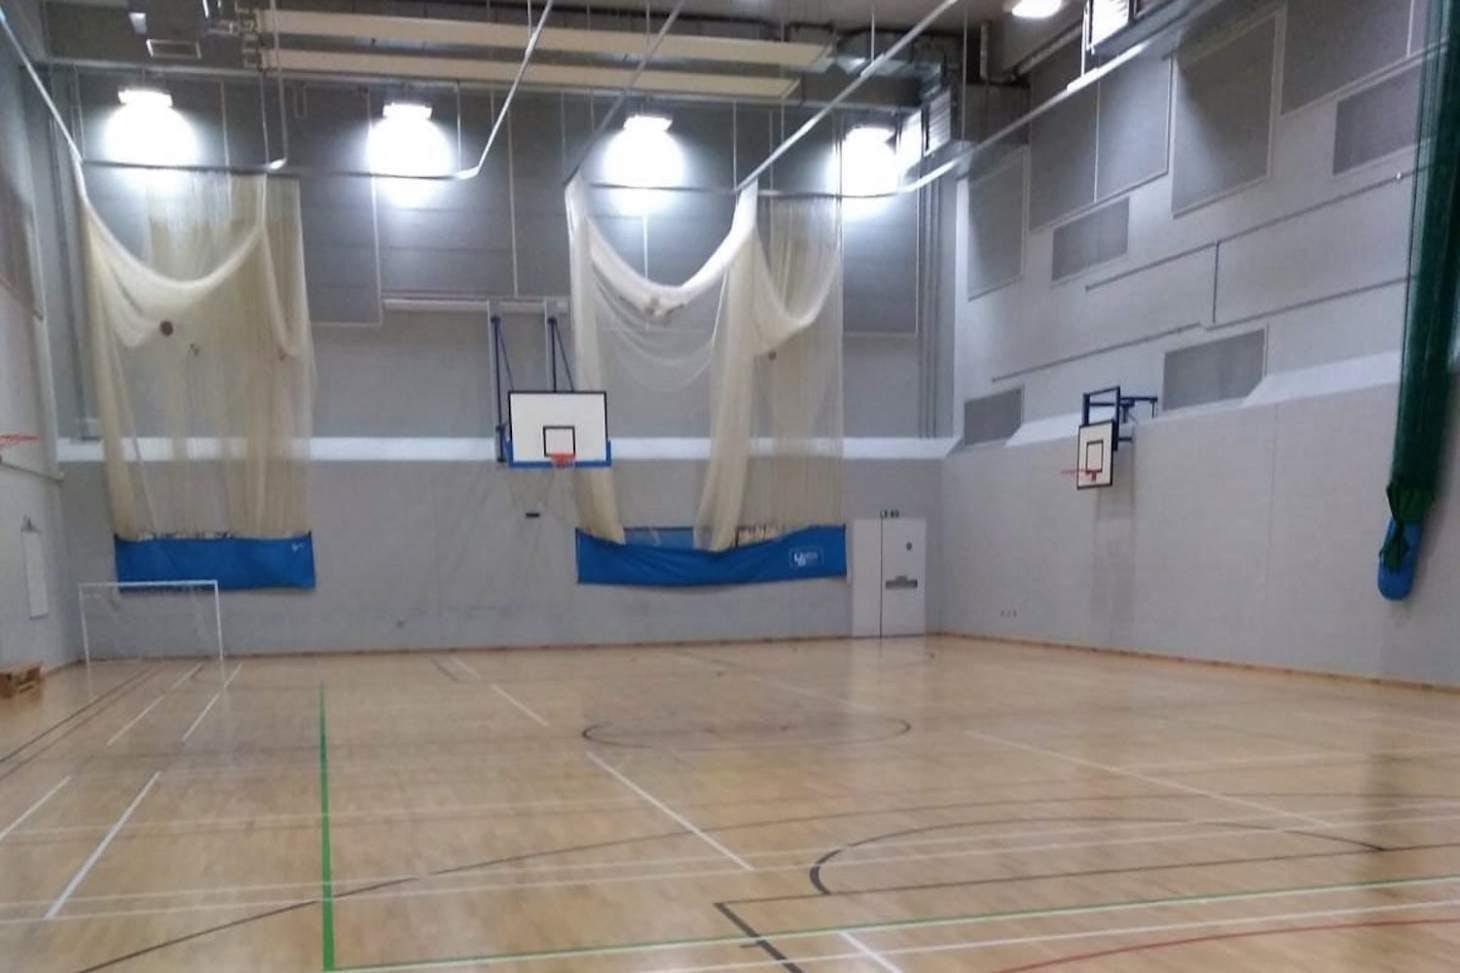 Kensington Aldridge Academy 5 a side | Indoor football pitch